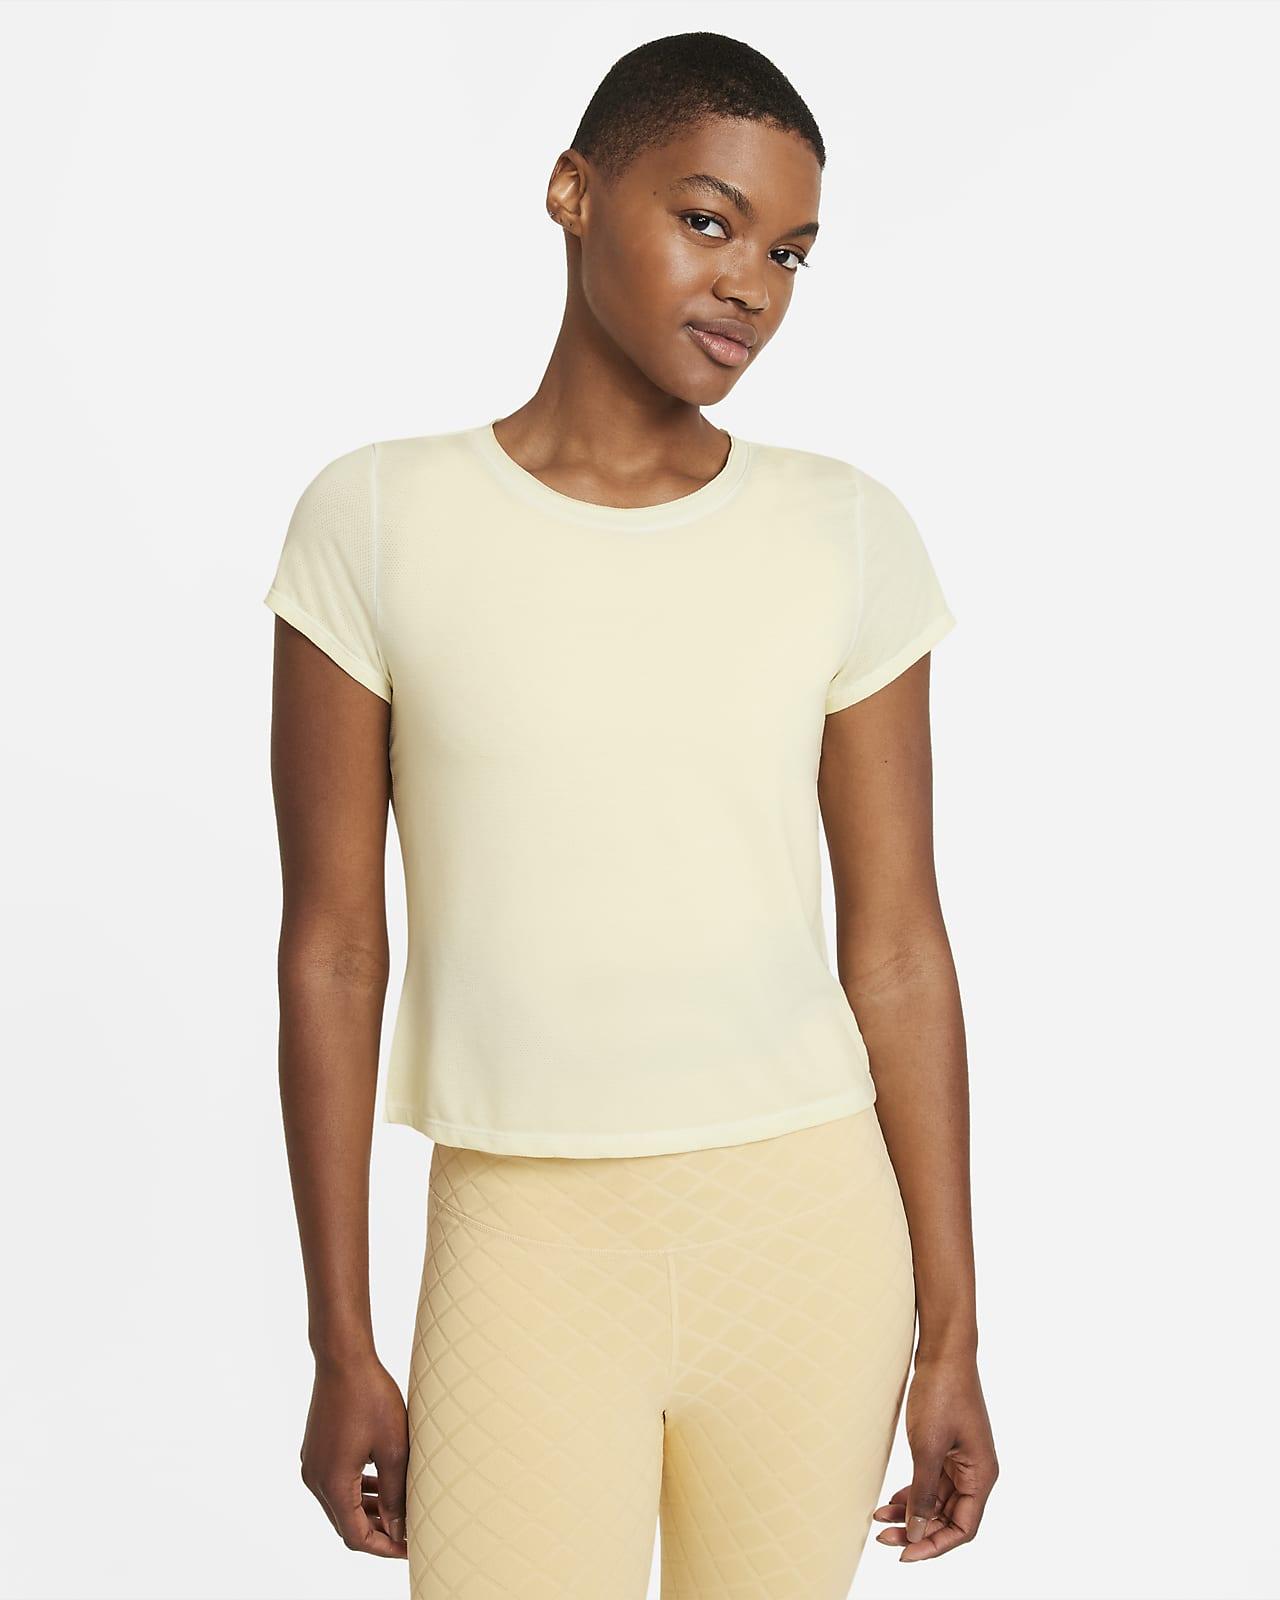 Nike Yoga Dri-FIT Women's Short-Sleeve Top